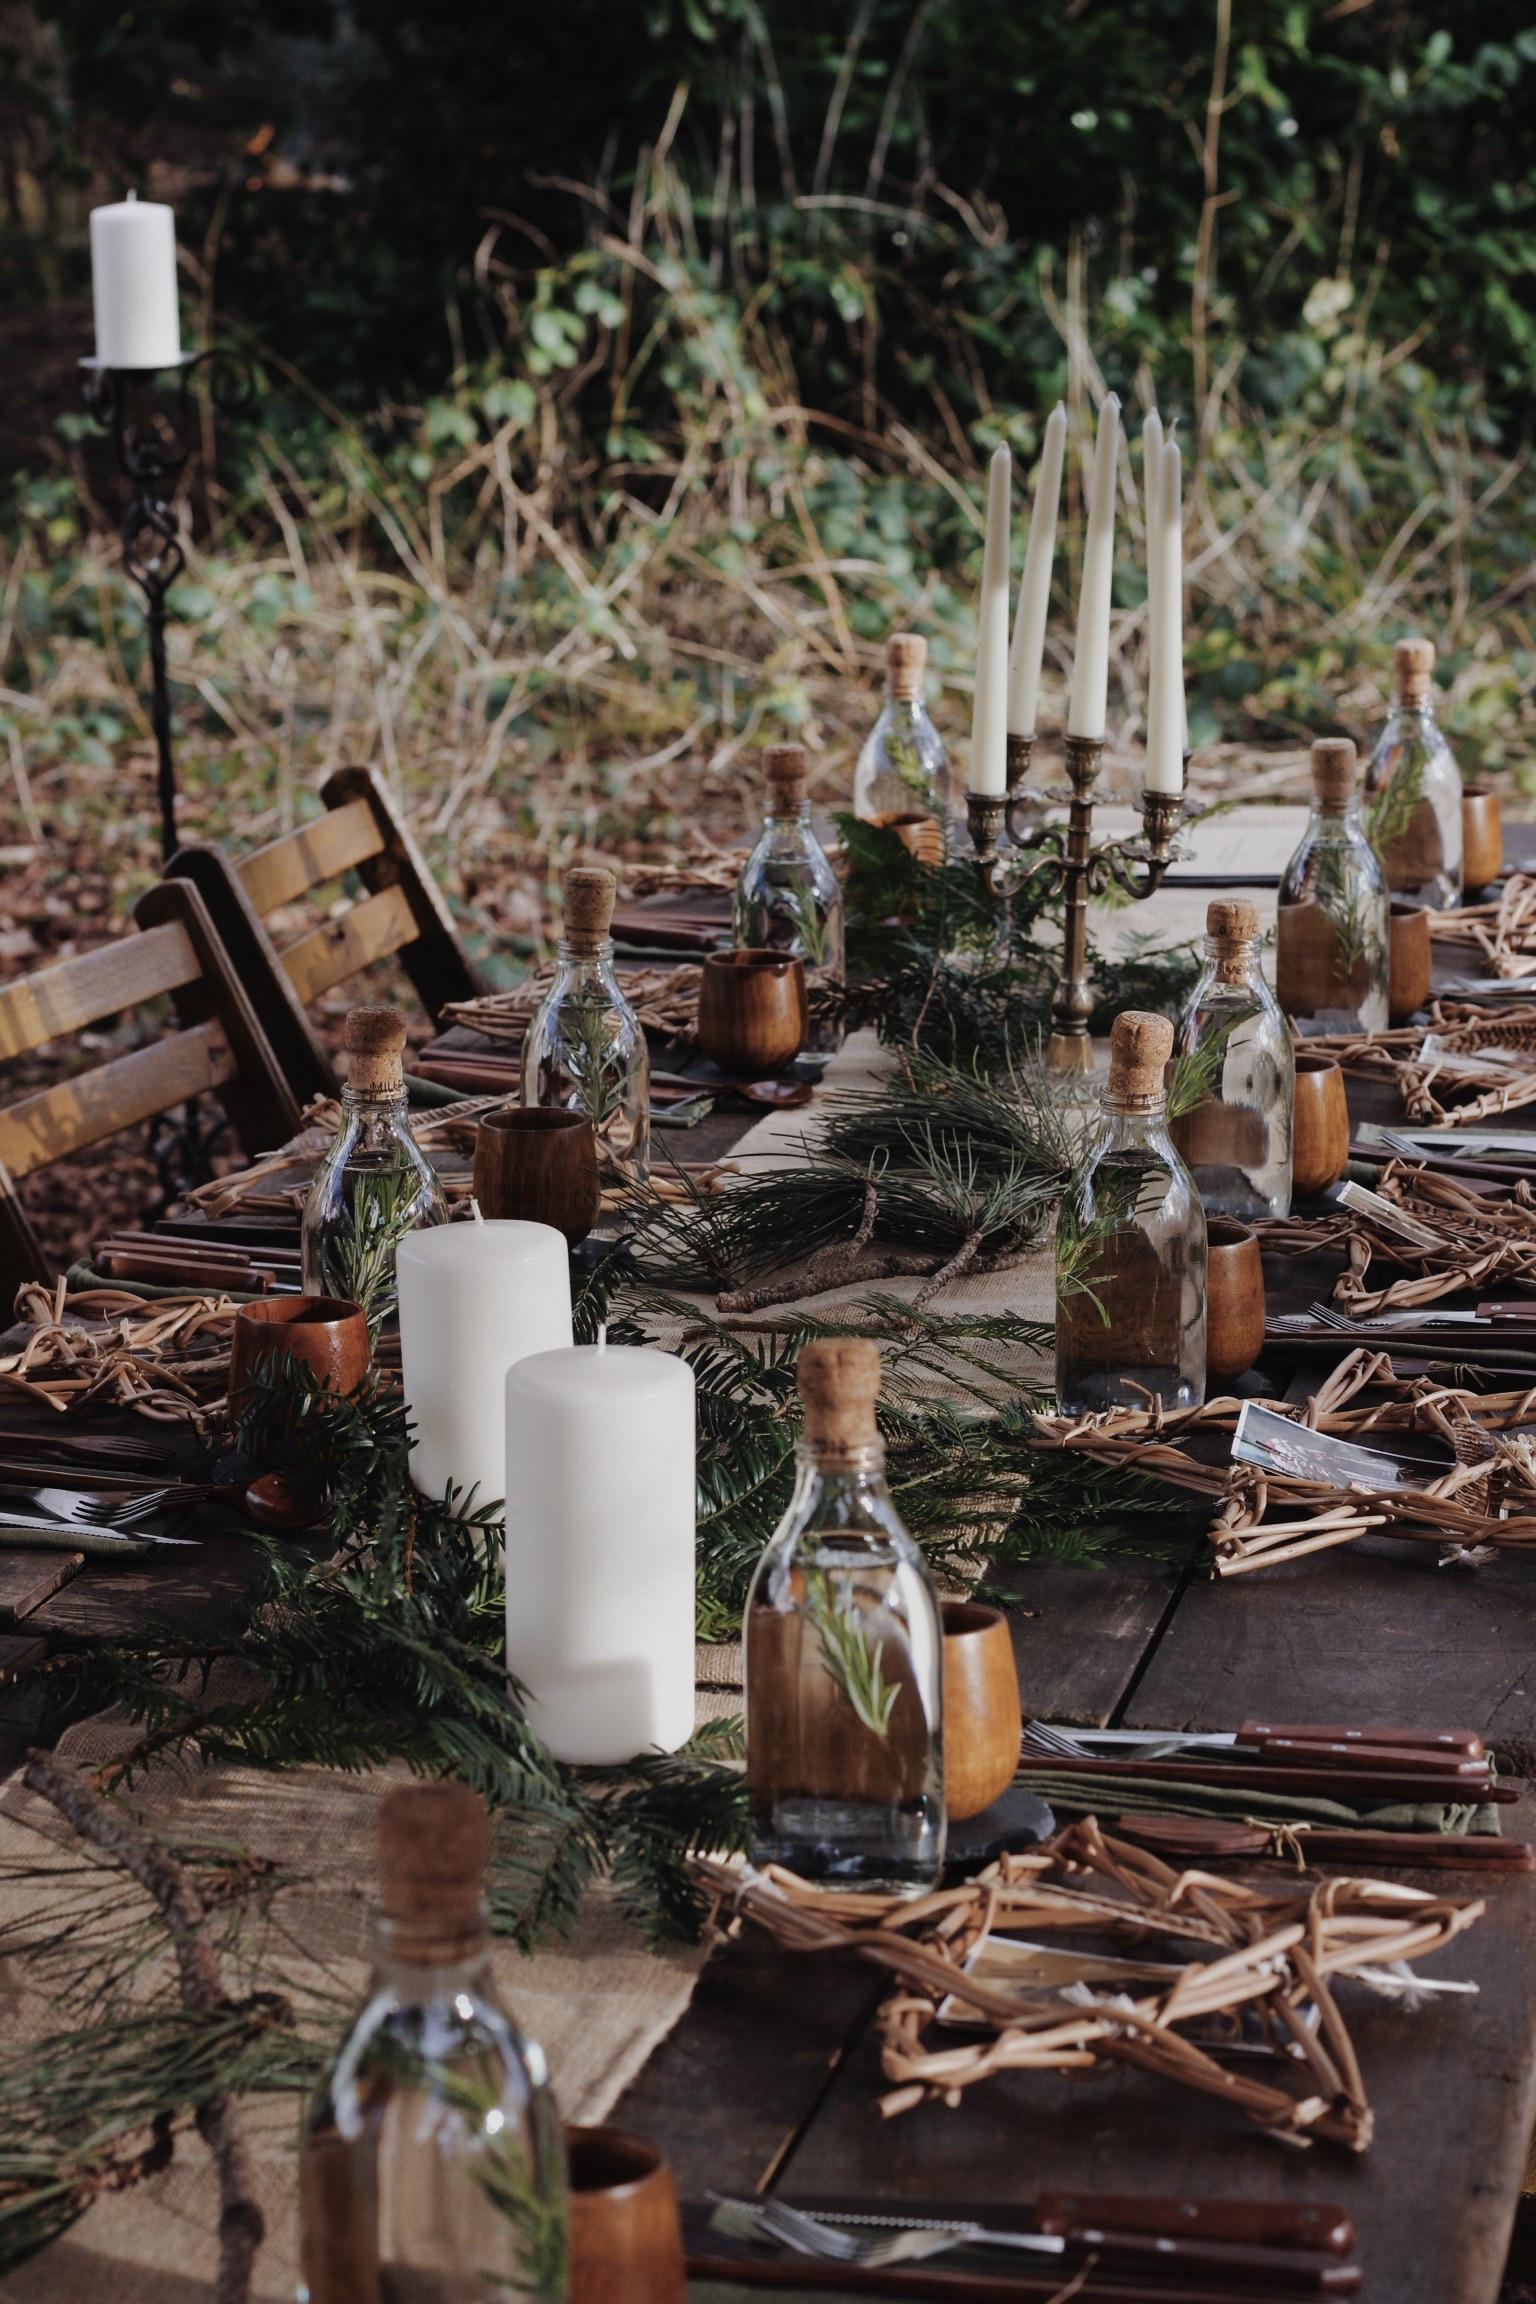 Seasons of the Wild | Outdoor Winter Gathering